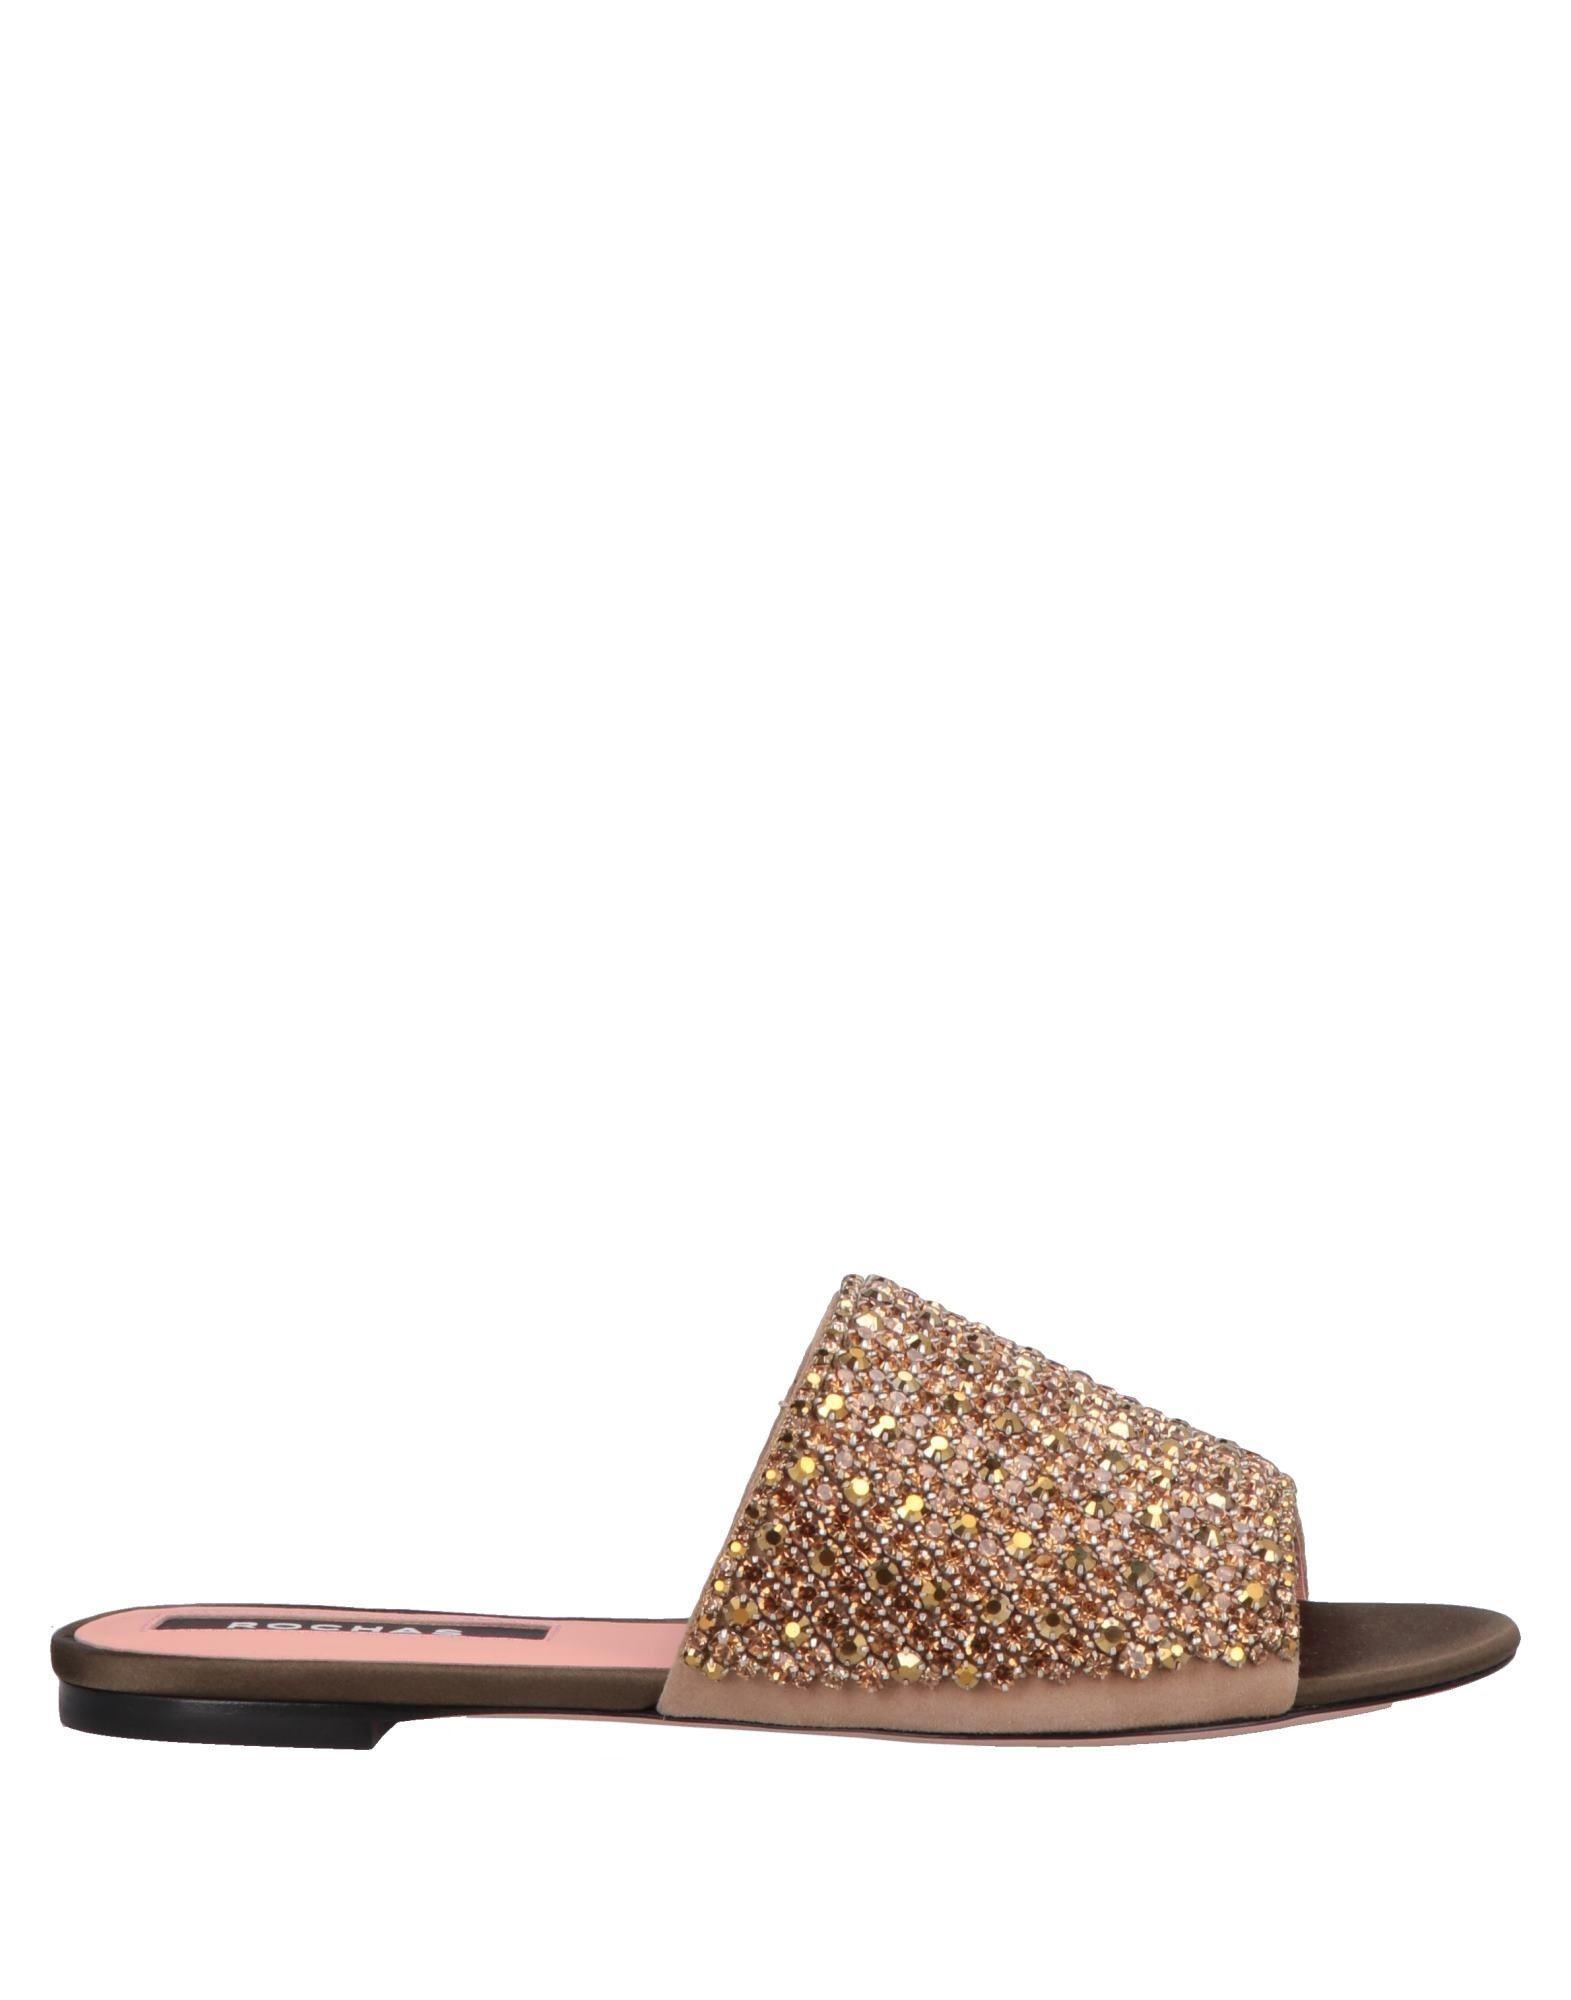 7da004db383a Lyst - Rochas Sandals in Metallic